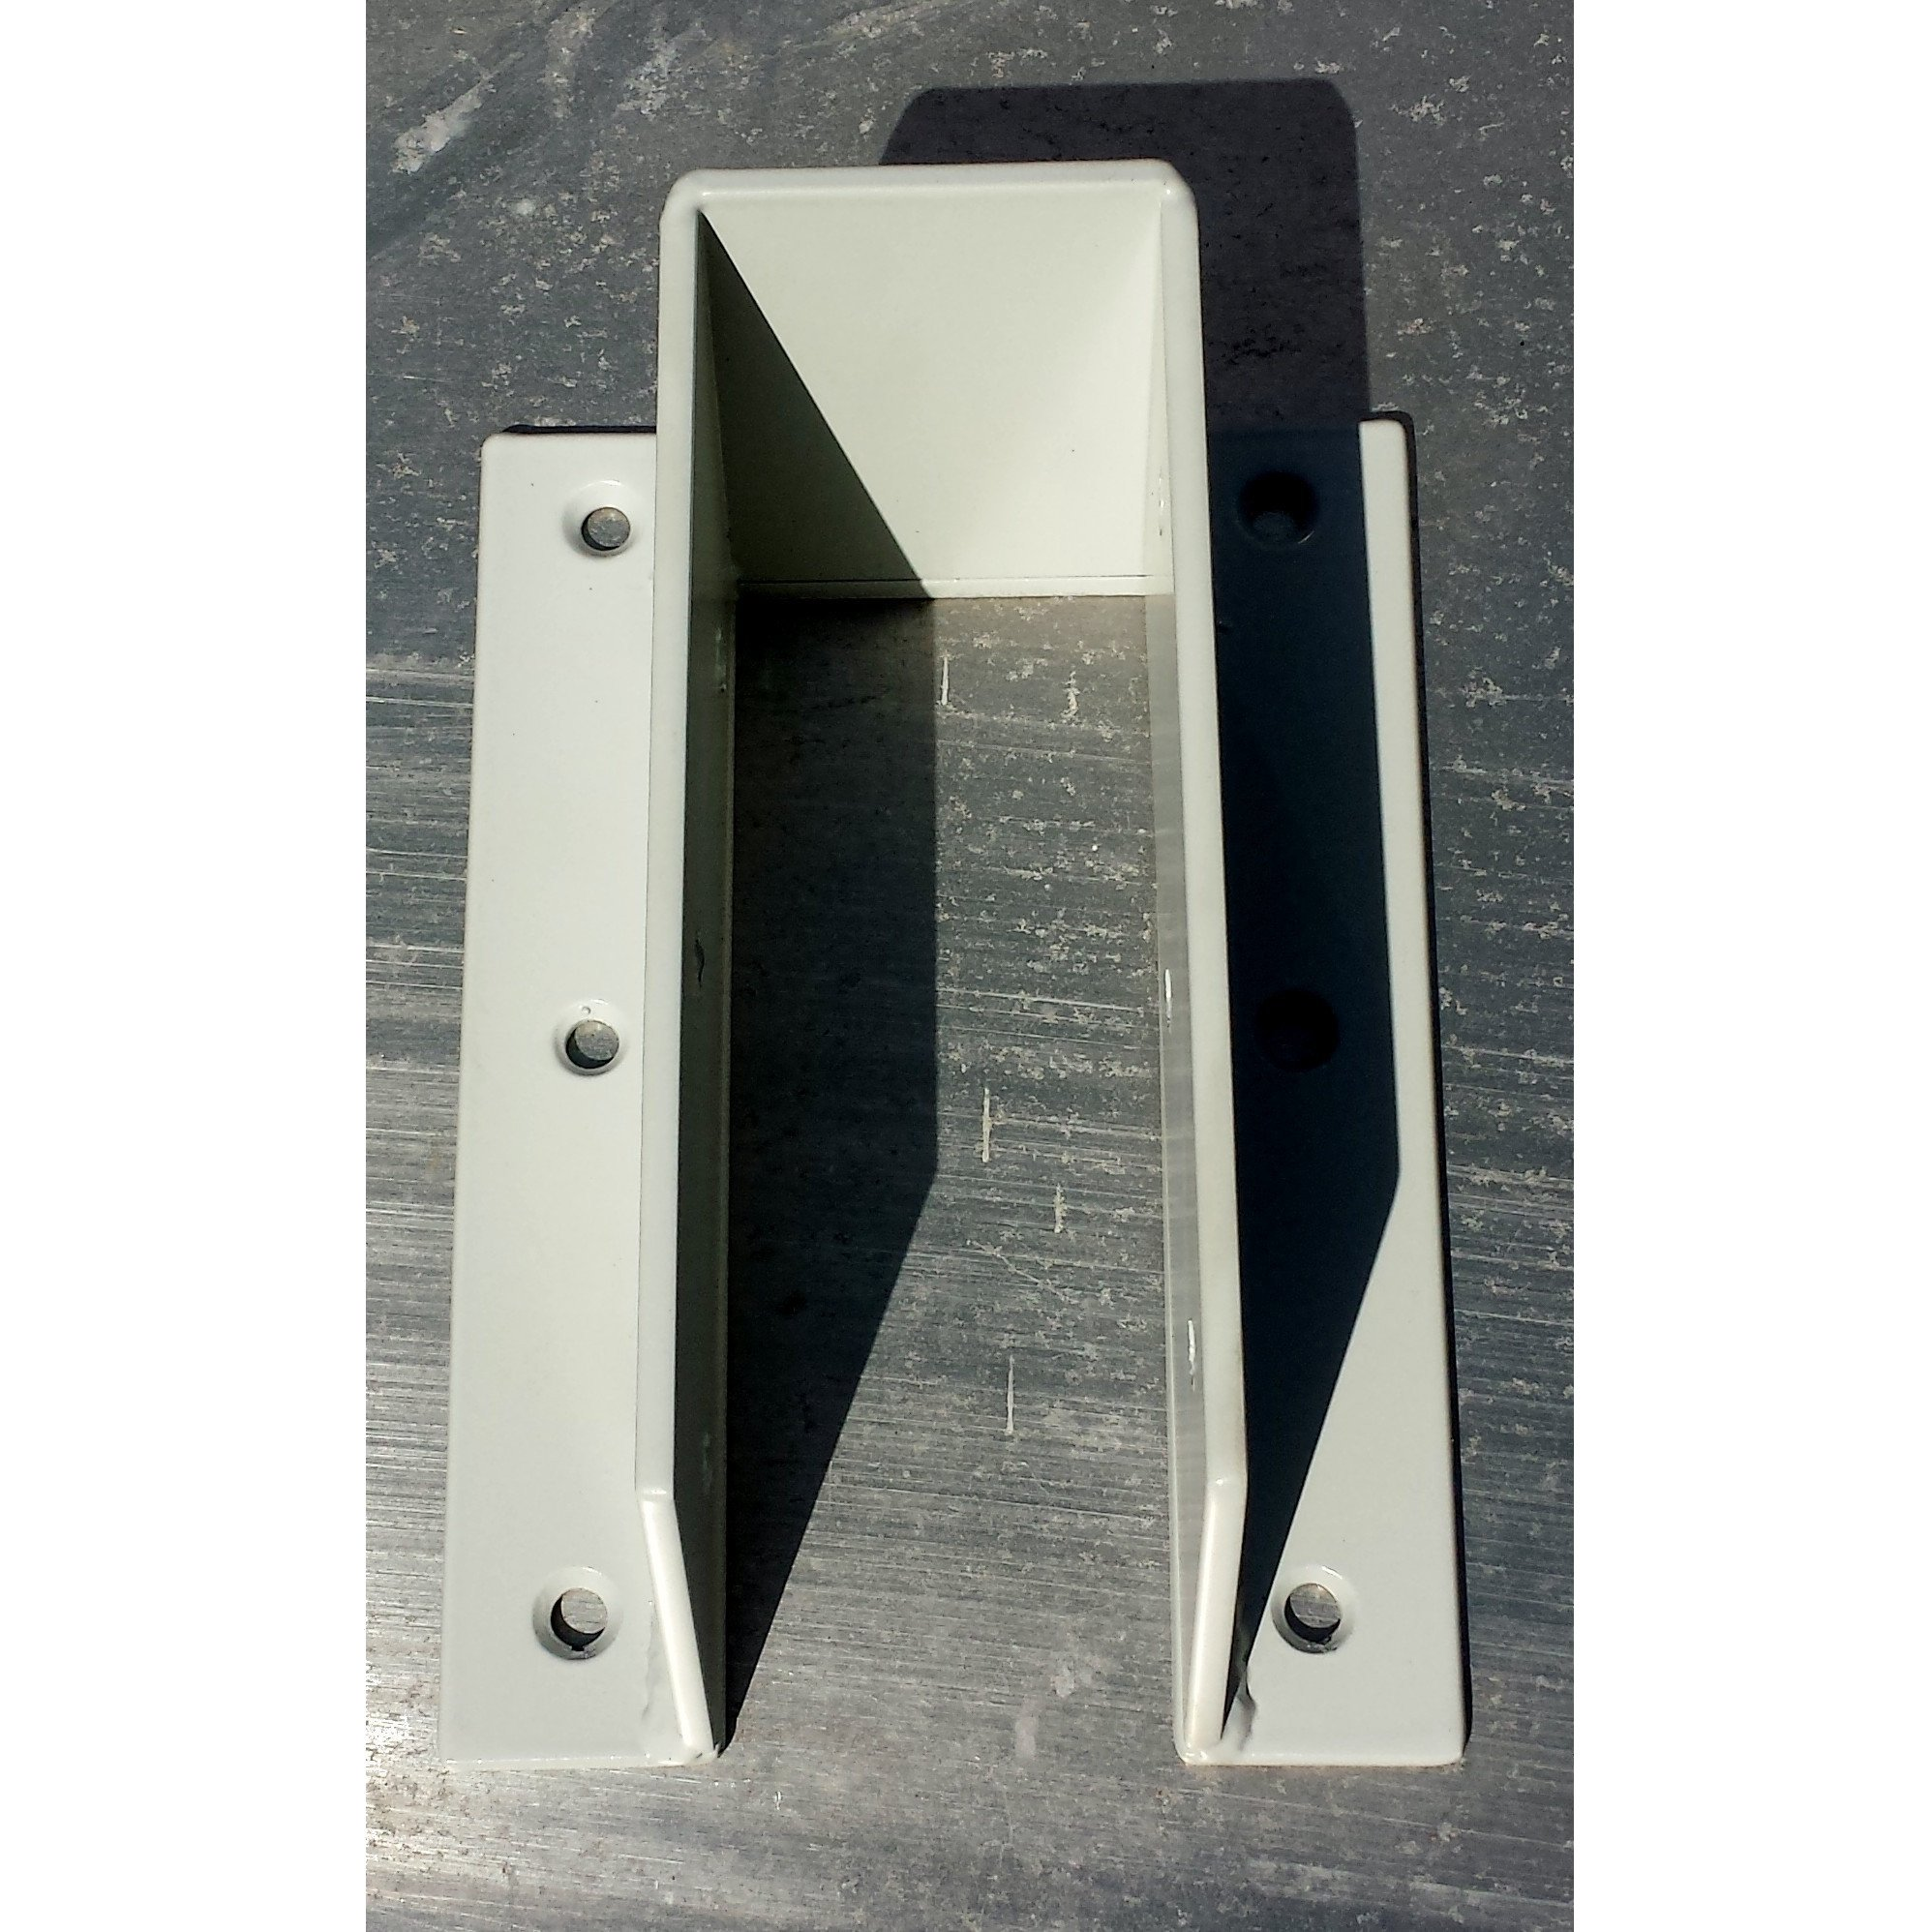 Custom Angled Joist Hangers